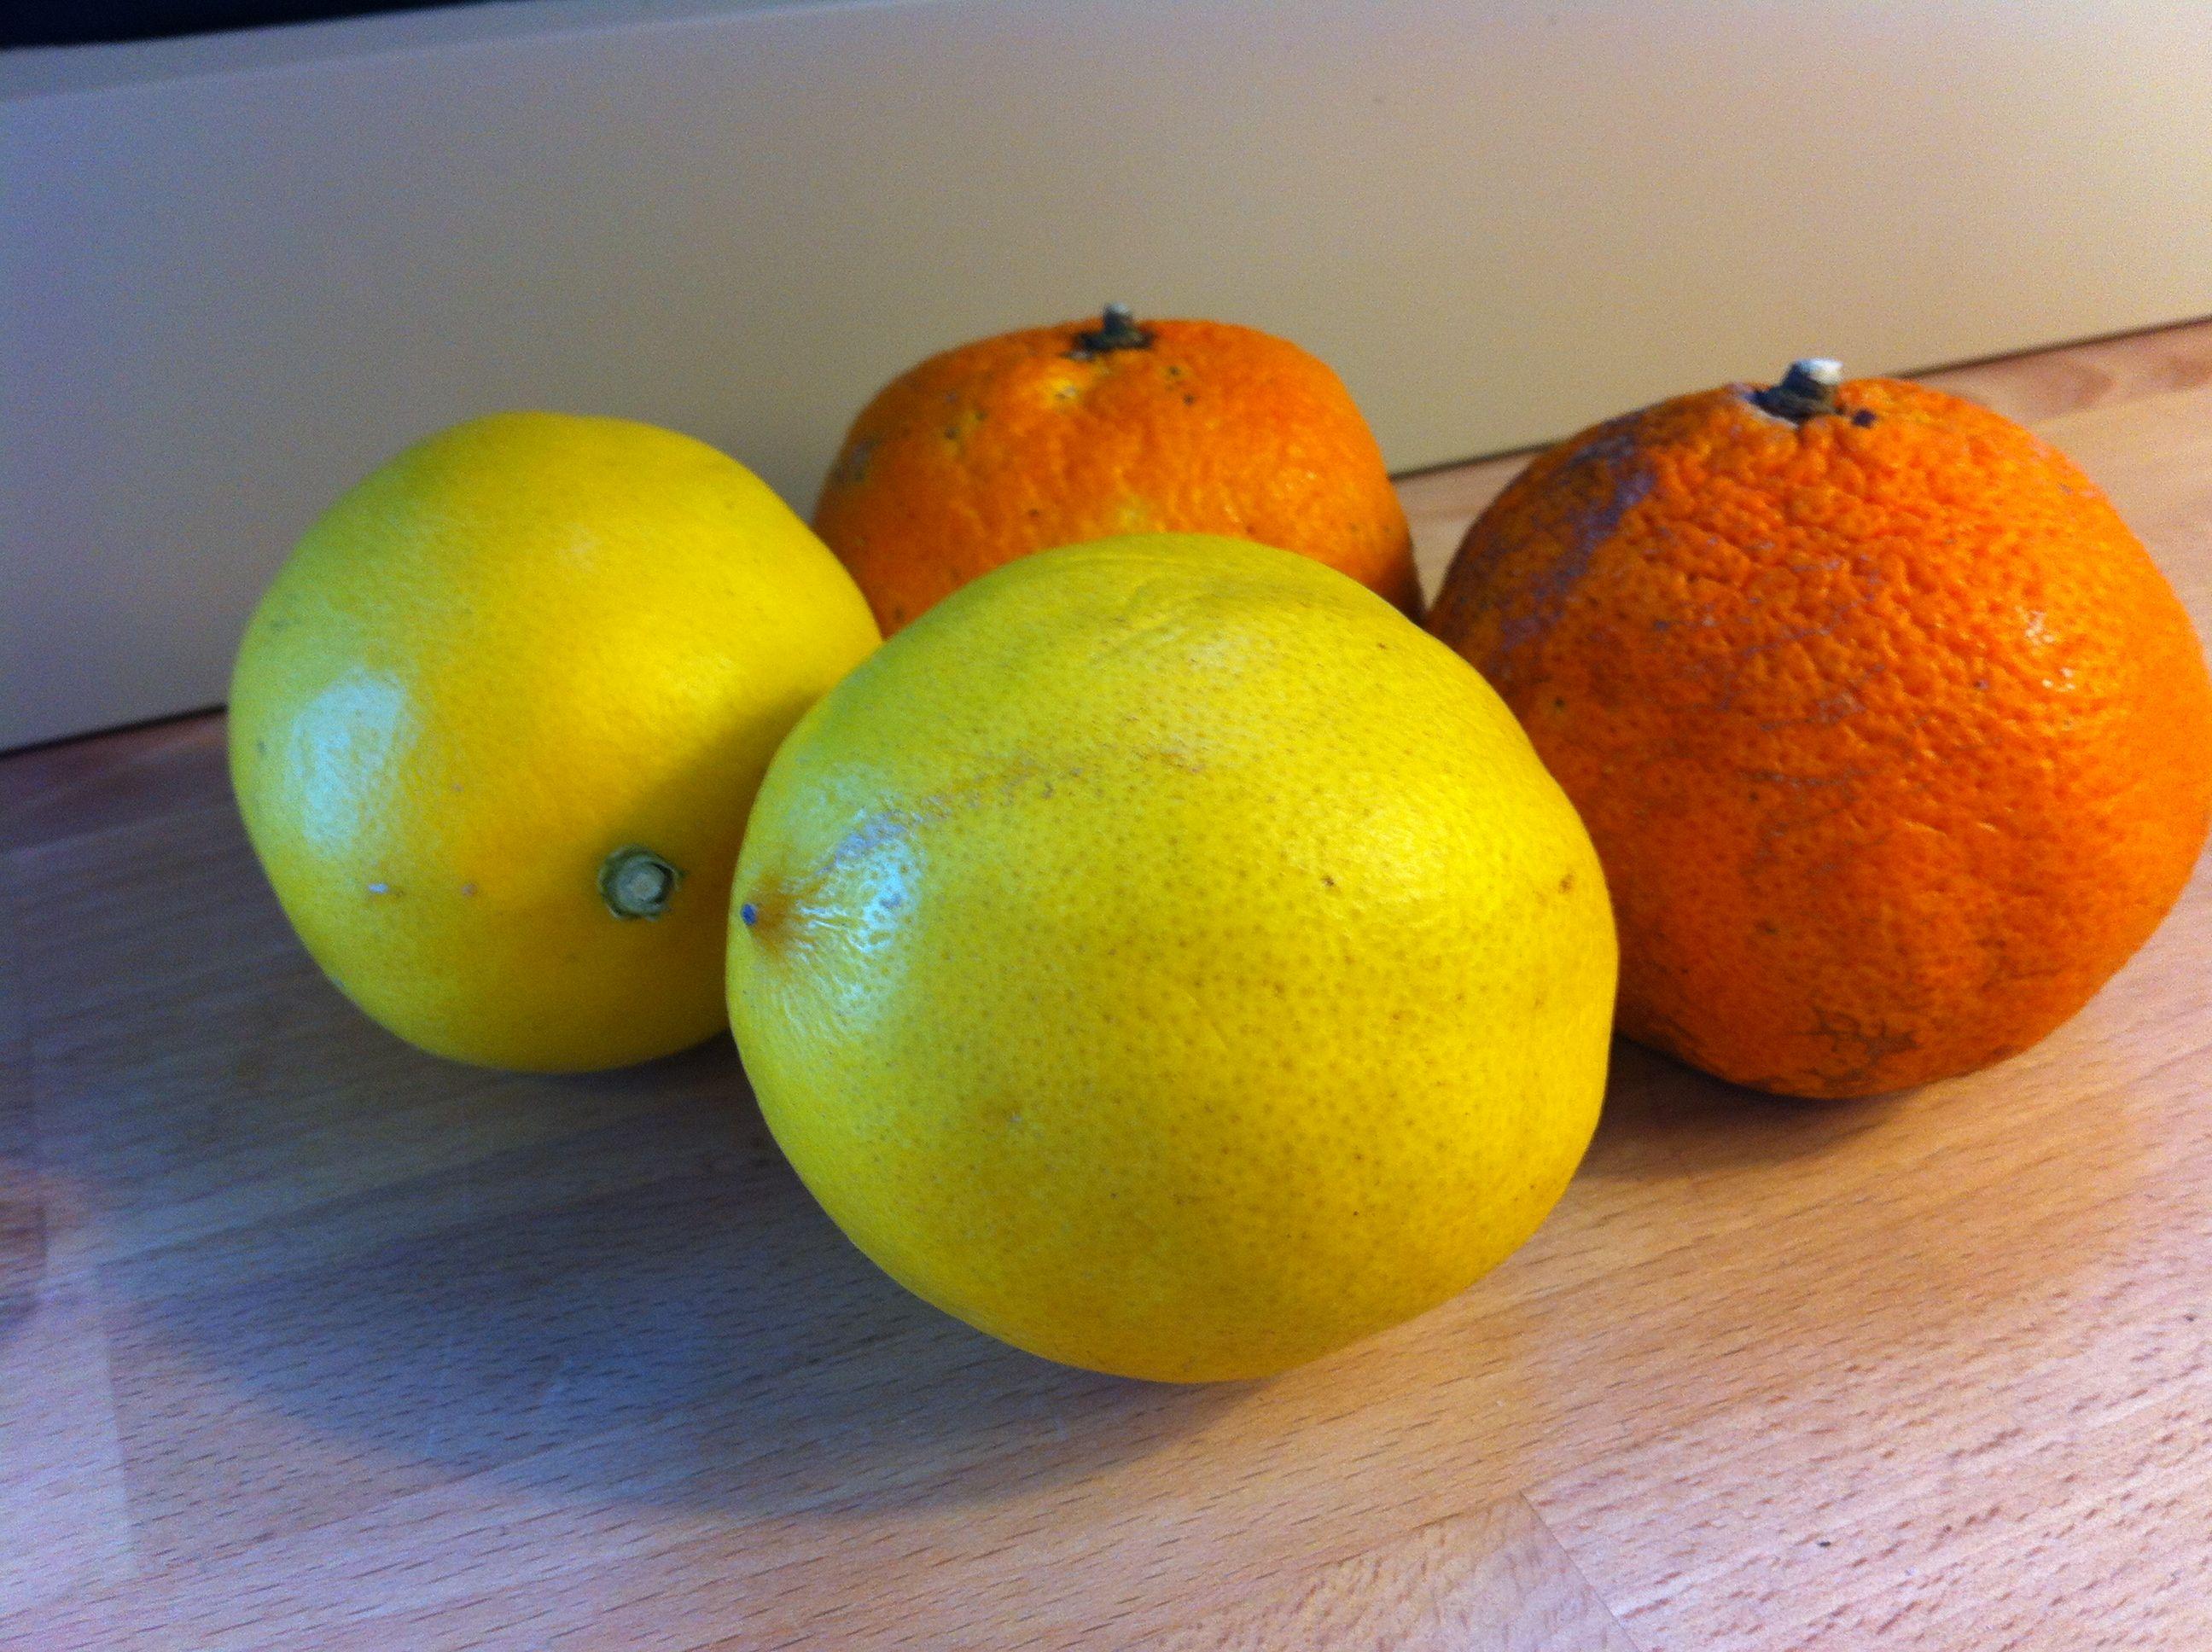 Meyer lemons & Satsuma oranges | Recipes - Meyer Lemon | Pinterest